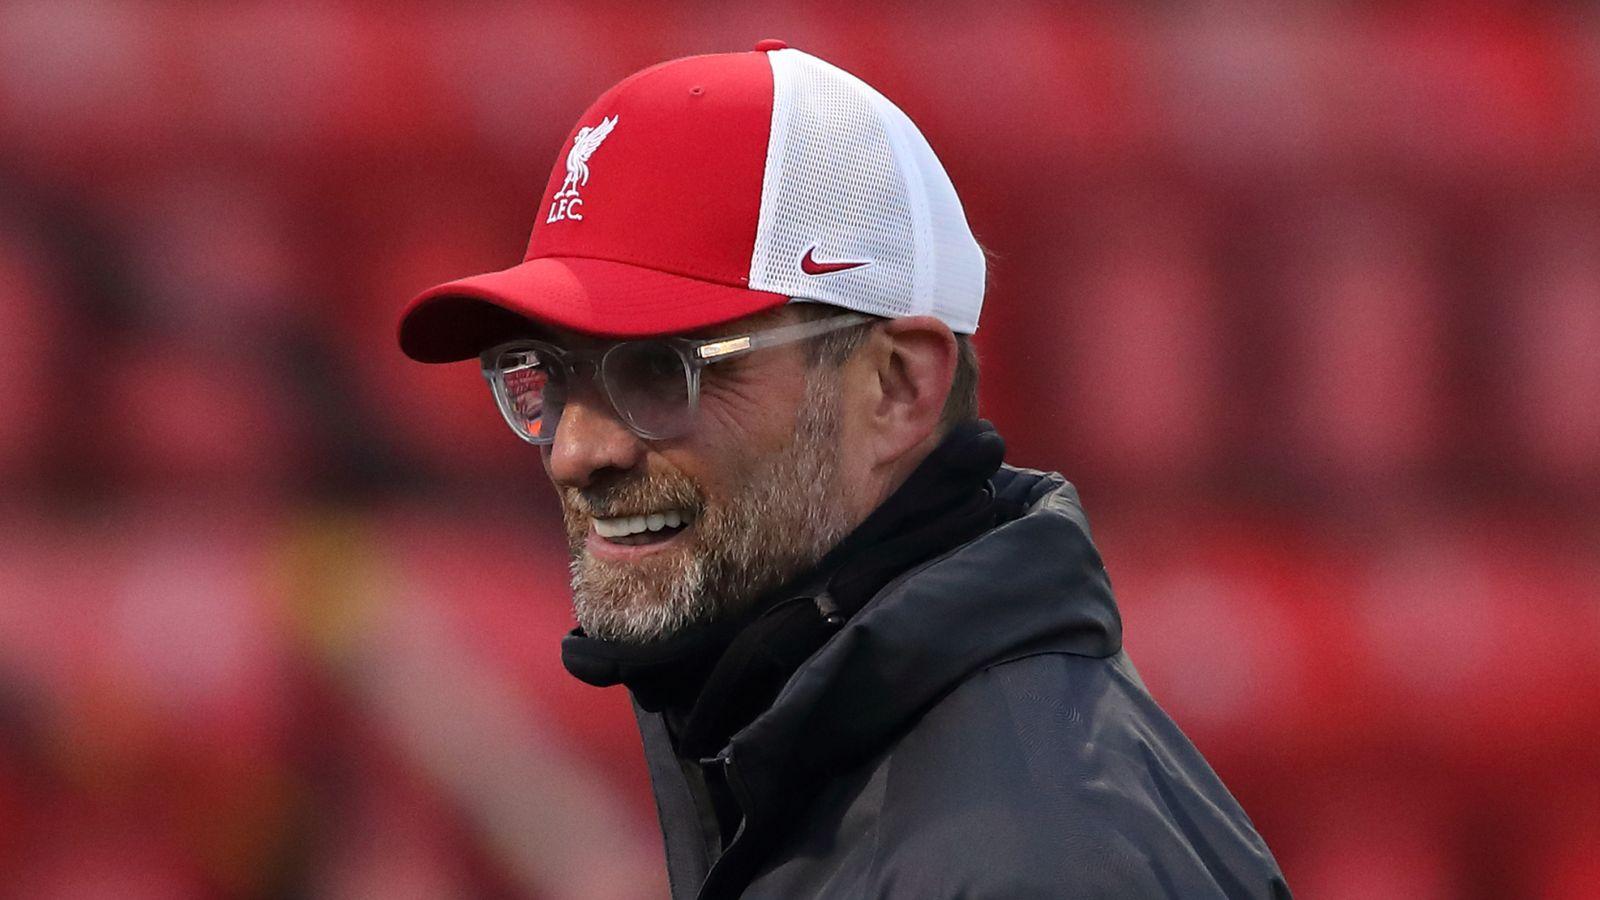 Jurgen Klopp: Liverpool's impressive home run has no